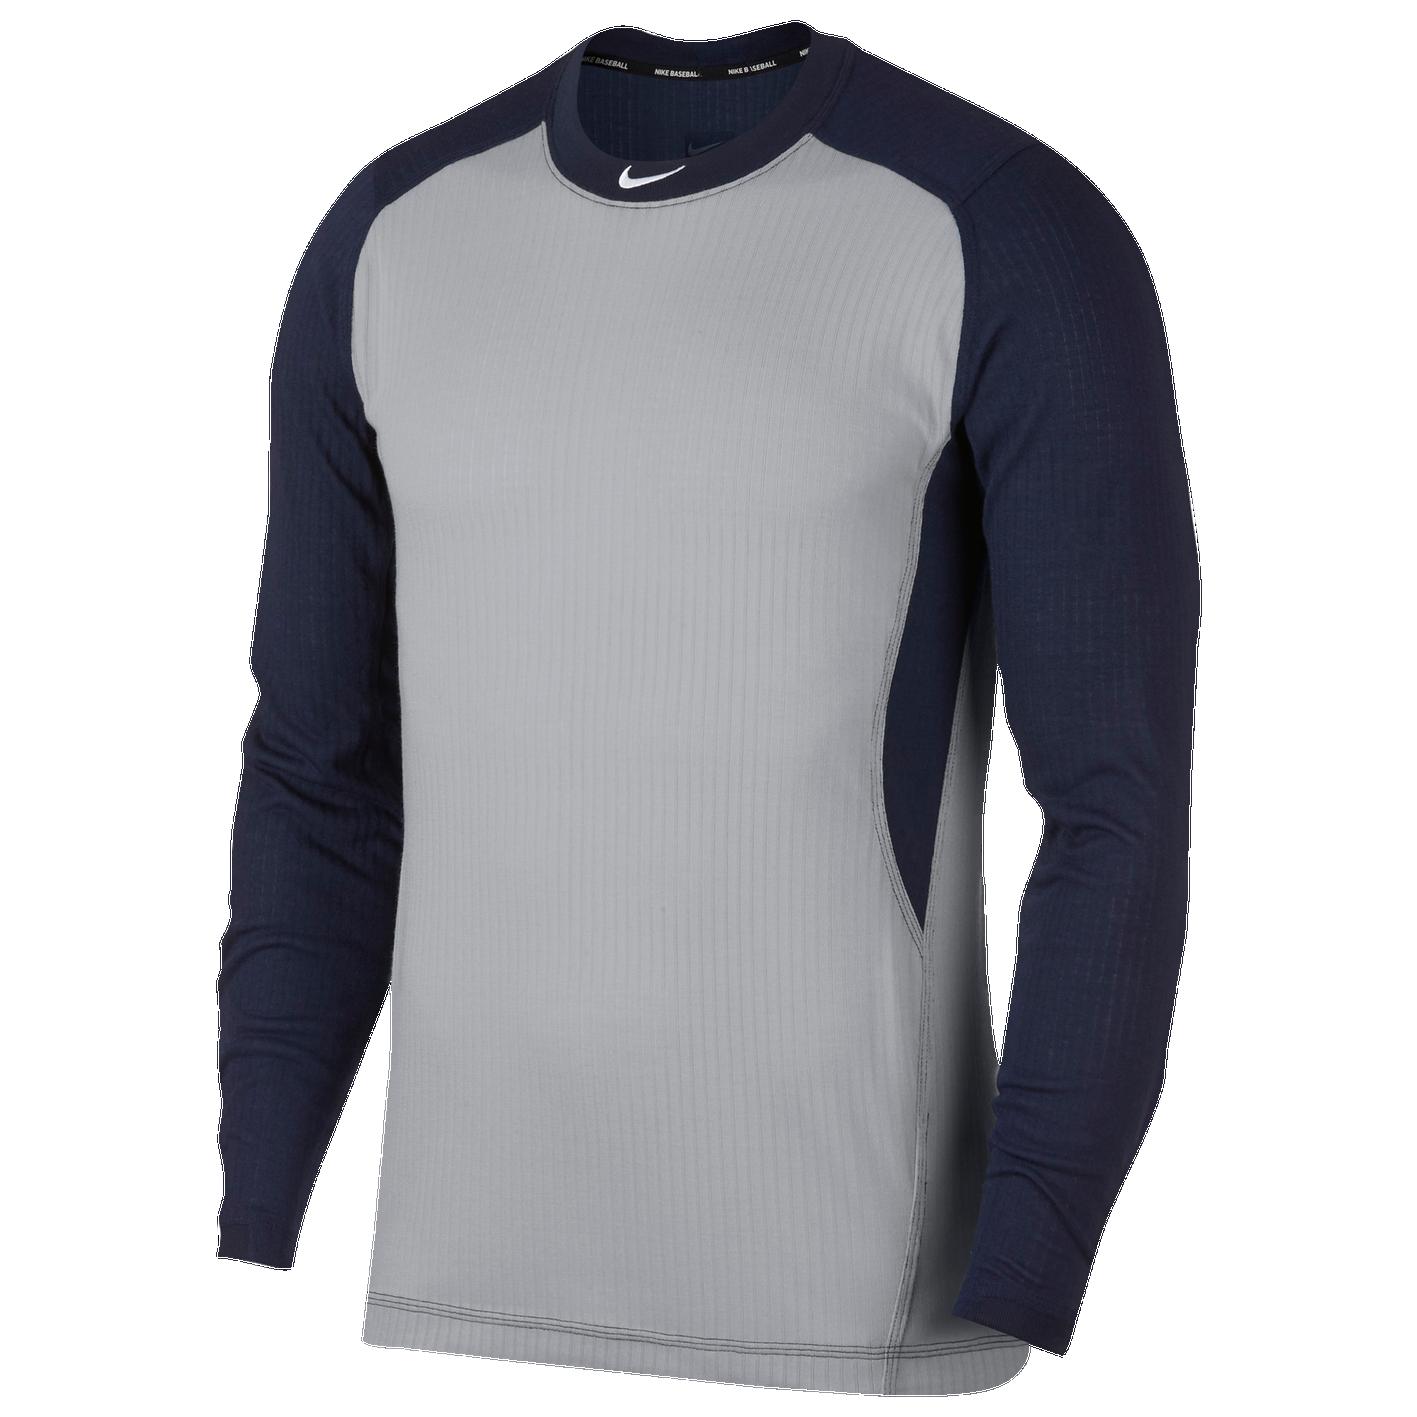 ef067f58 Nike Long Sleeve Game Top - Men's - Baseball - Clothing - Wolf Grey ...